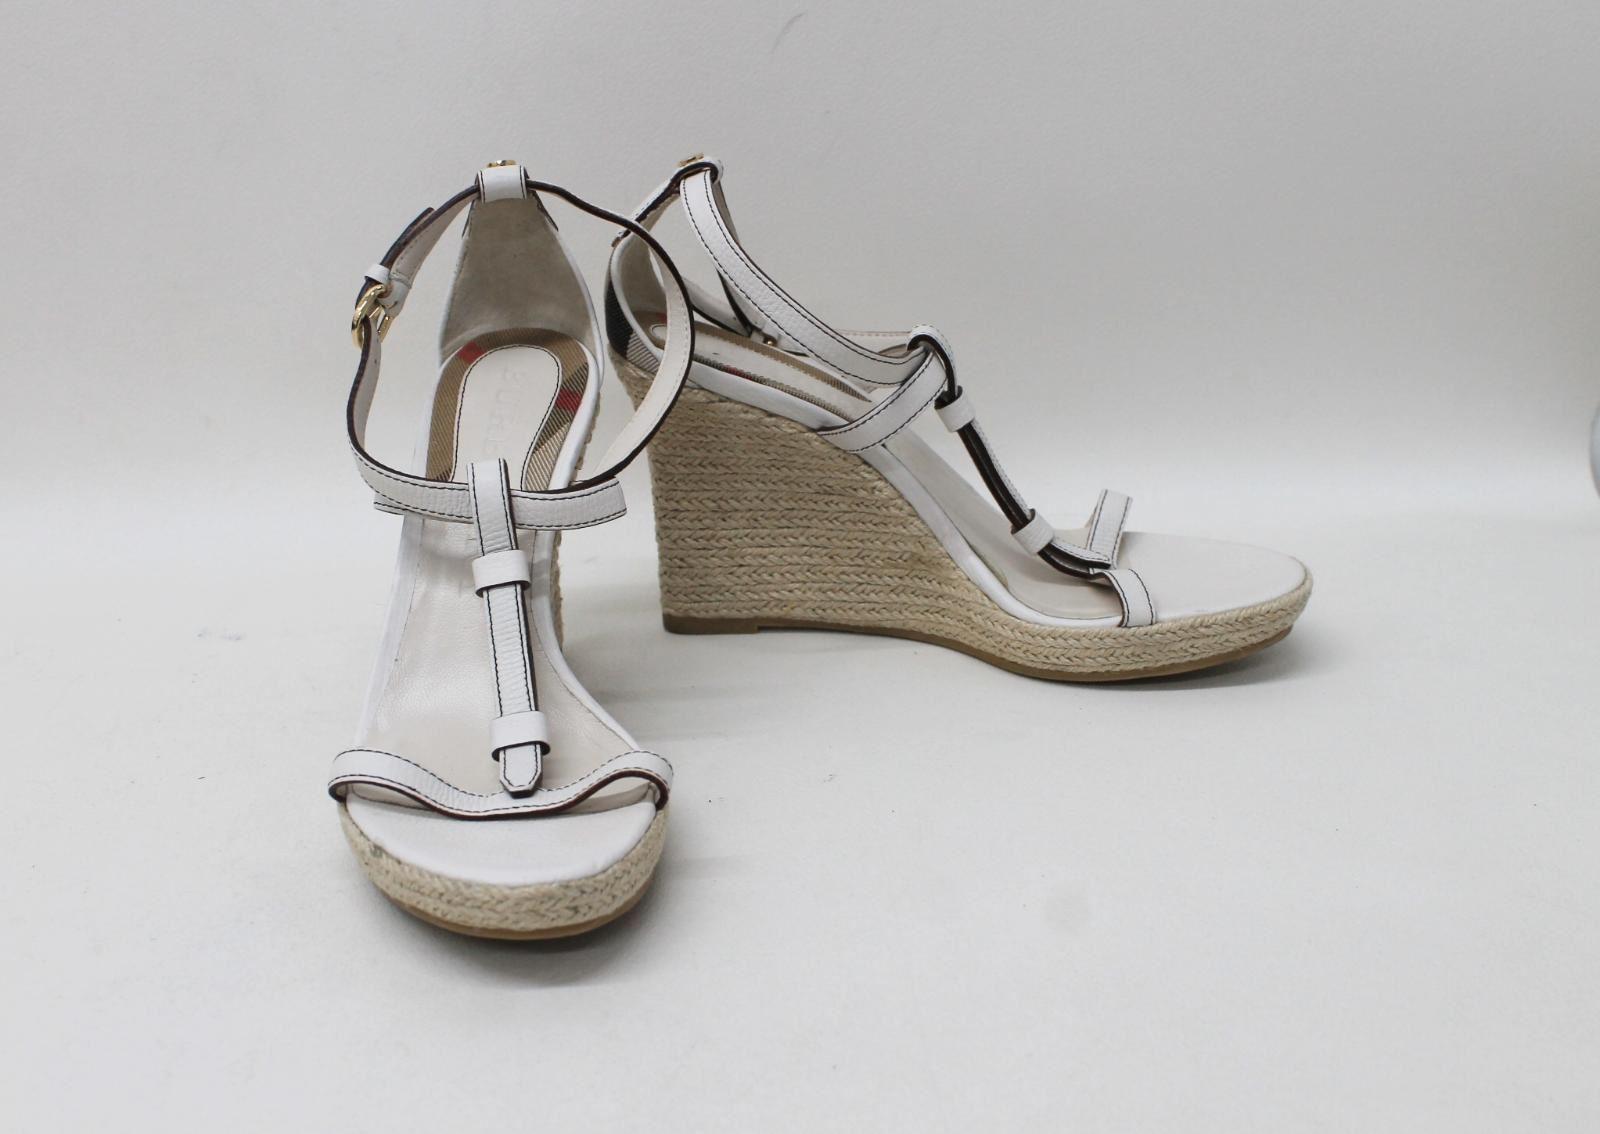 b2bdd4dd4a BURBERRY Ladies White Leather T-Bar Strappy Wedges Sandals Size EU40 ...